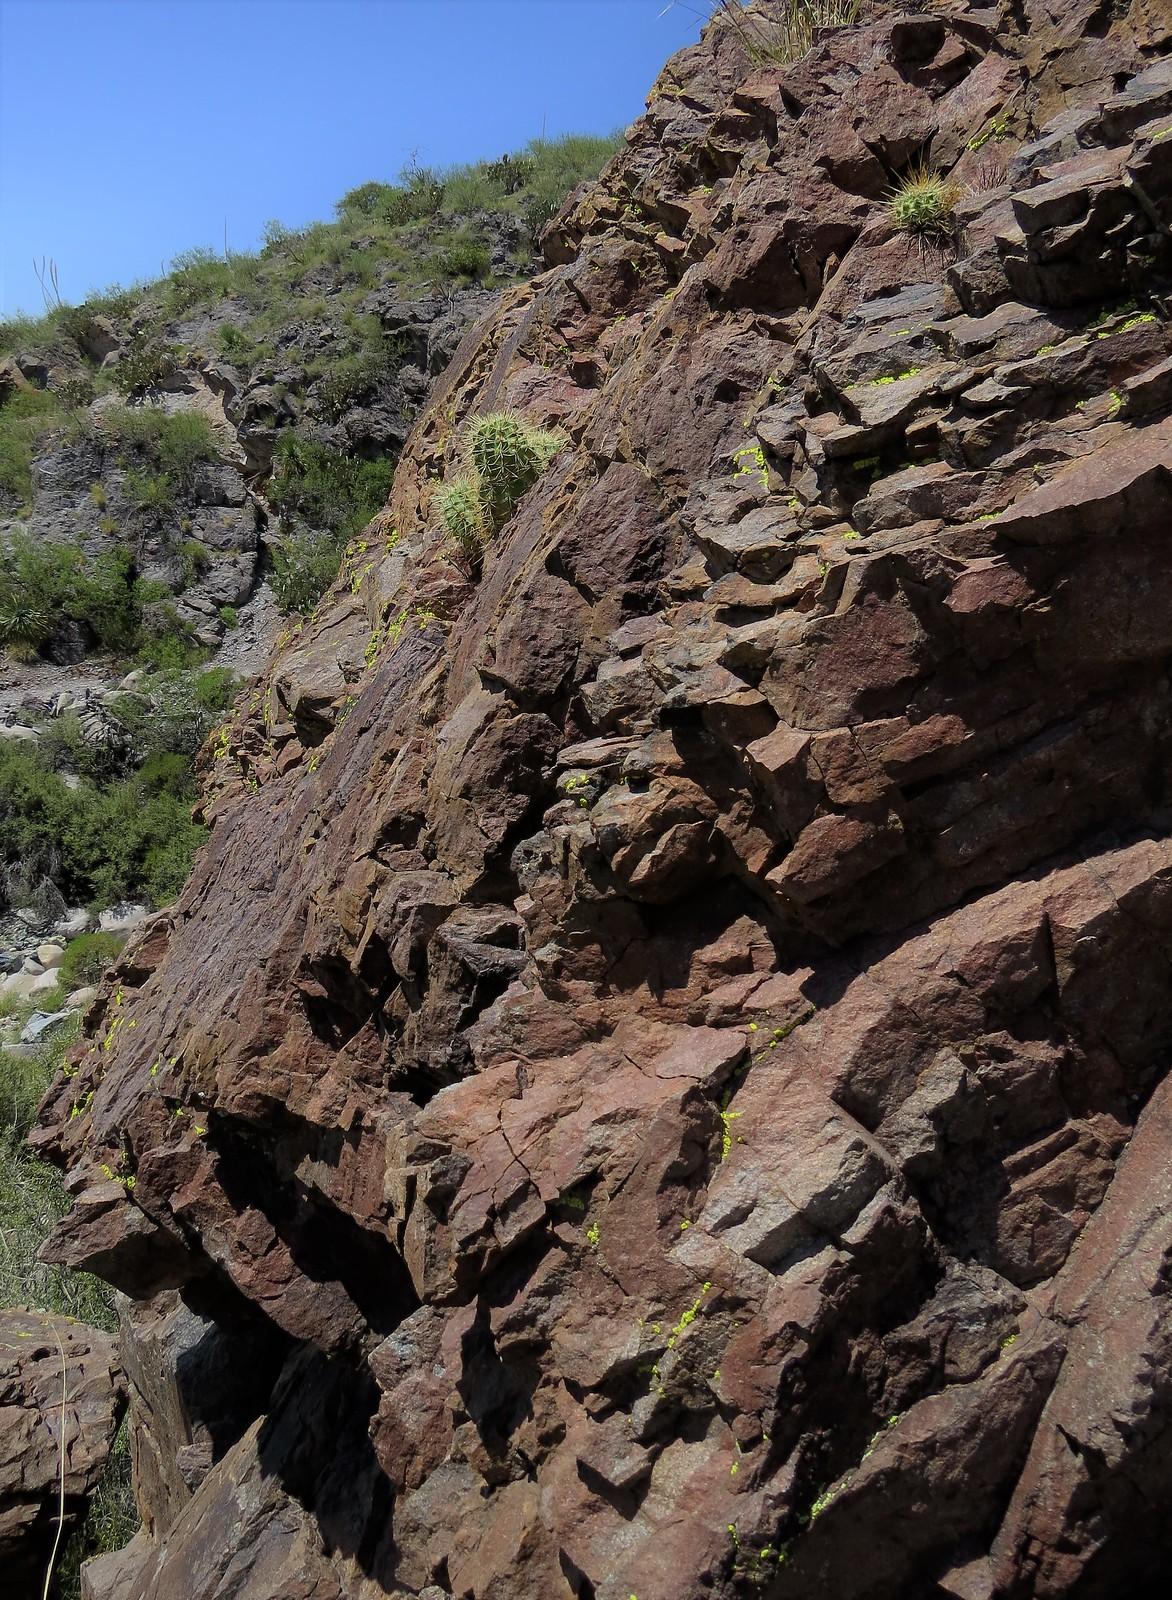 La Cueva trail, Organ Mountains, NM